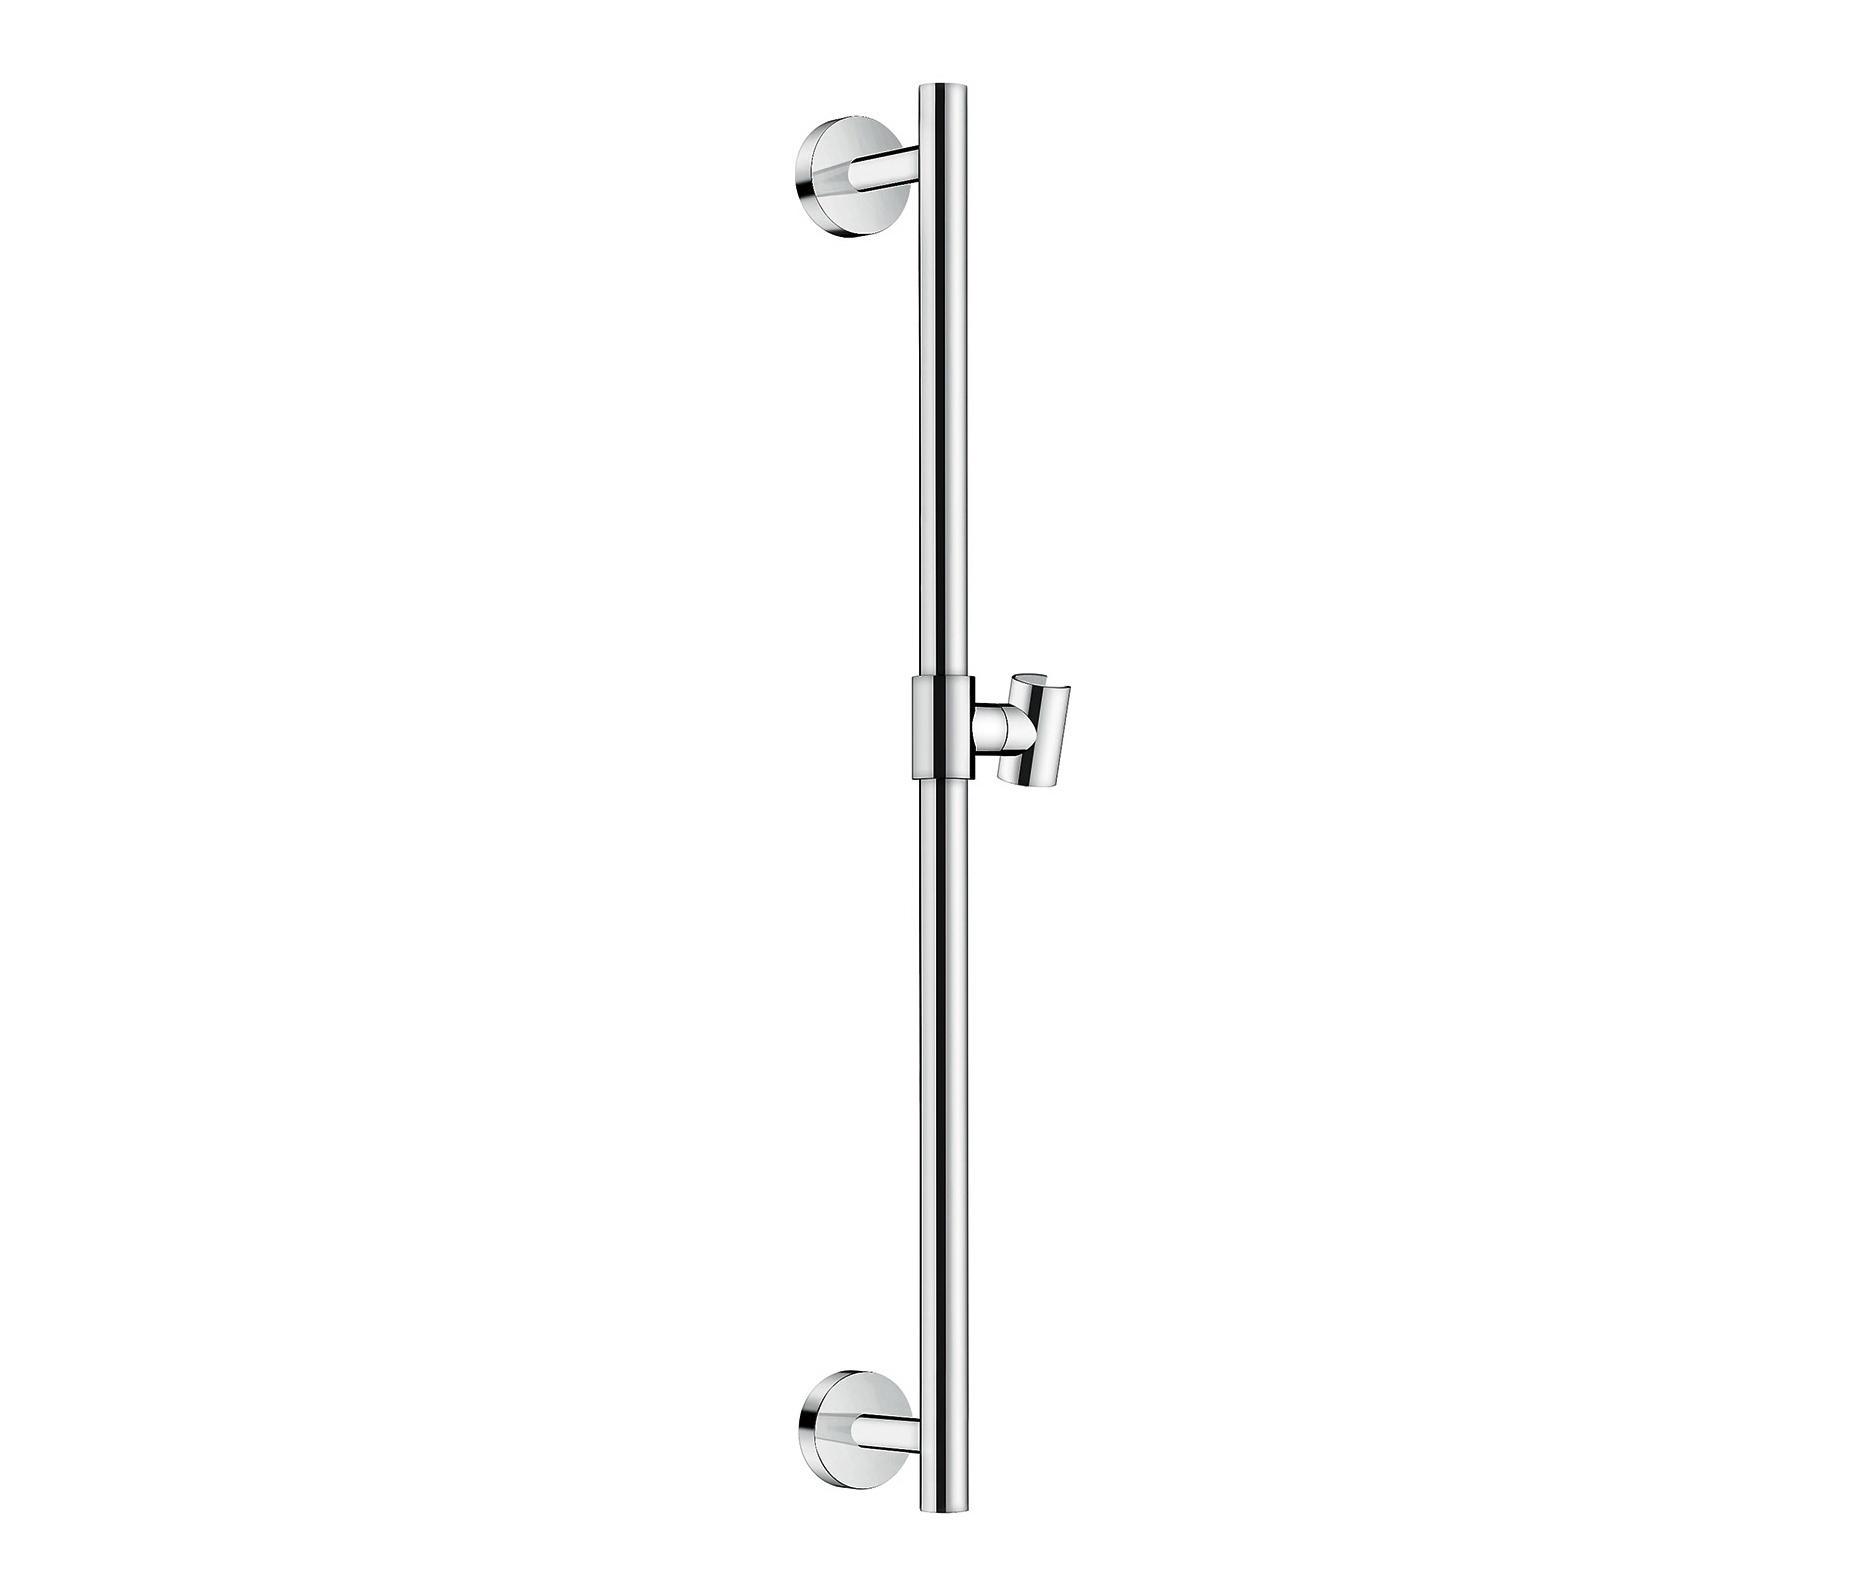 Hansgrohe Unica Comfort Wall Bar 0 65 M Architonic